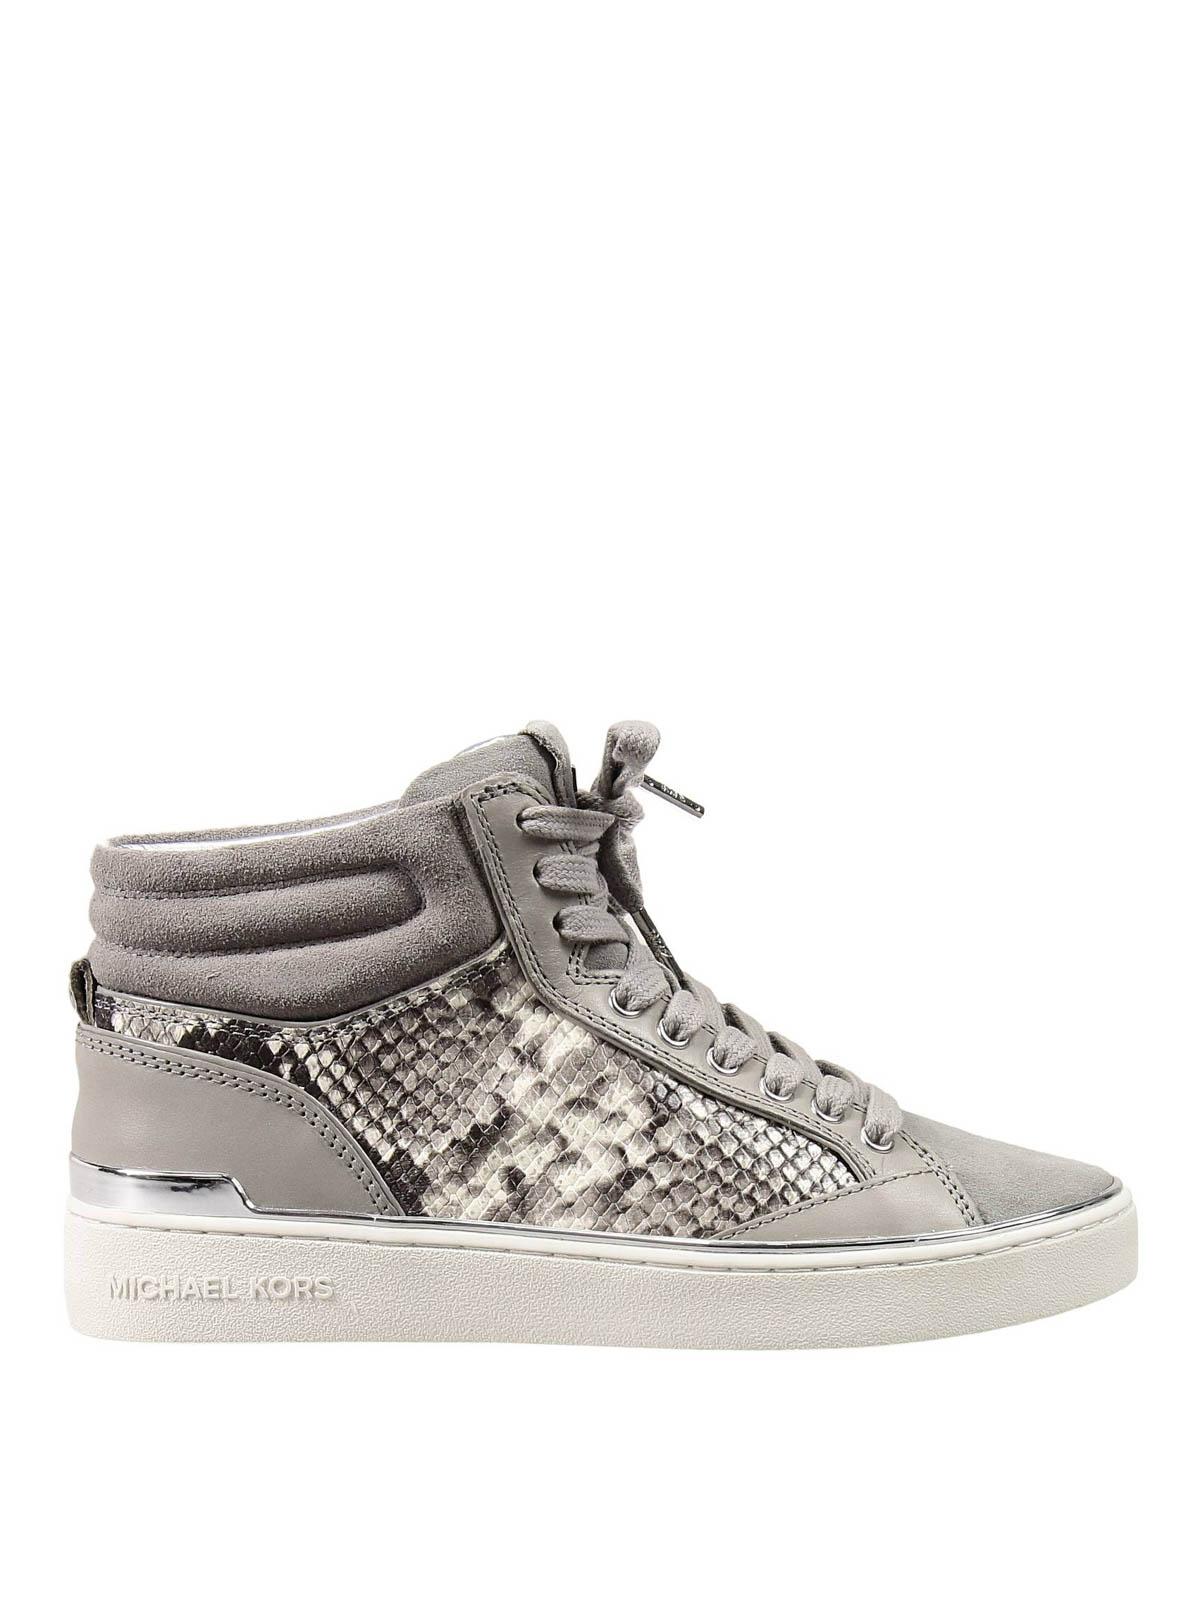 b0b093b2cb9 Michael Kors - Snake print sneakers - trainers - 43T5KYFE5E | iKRIX.com